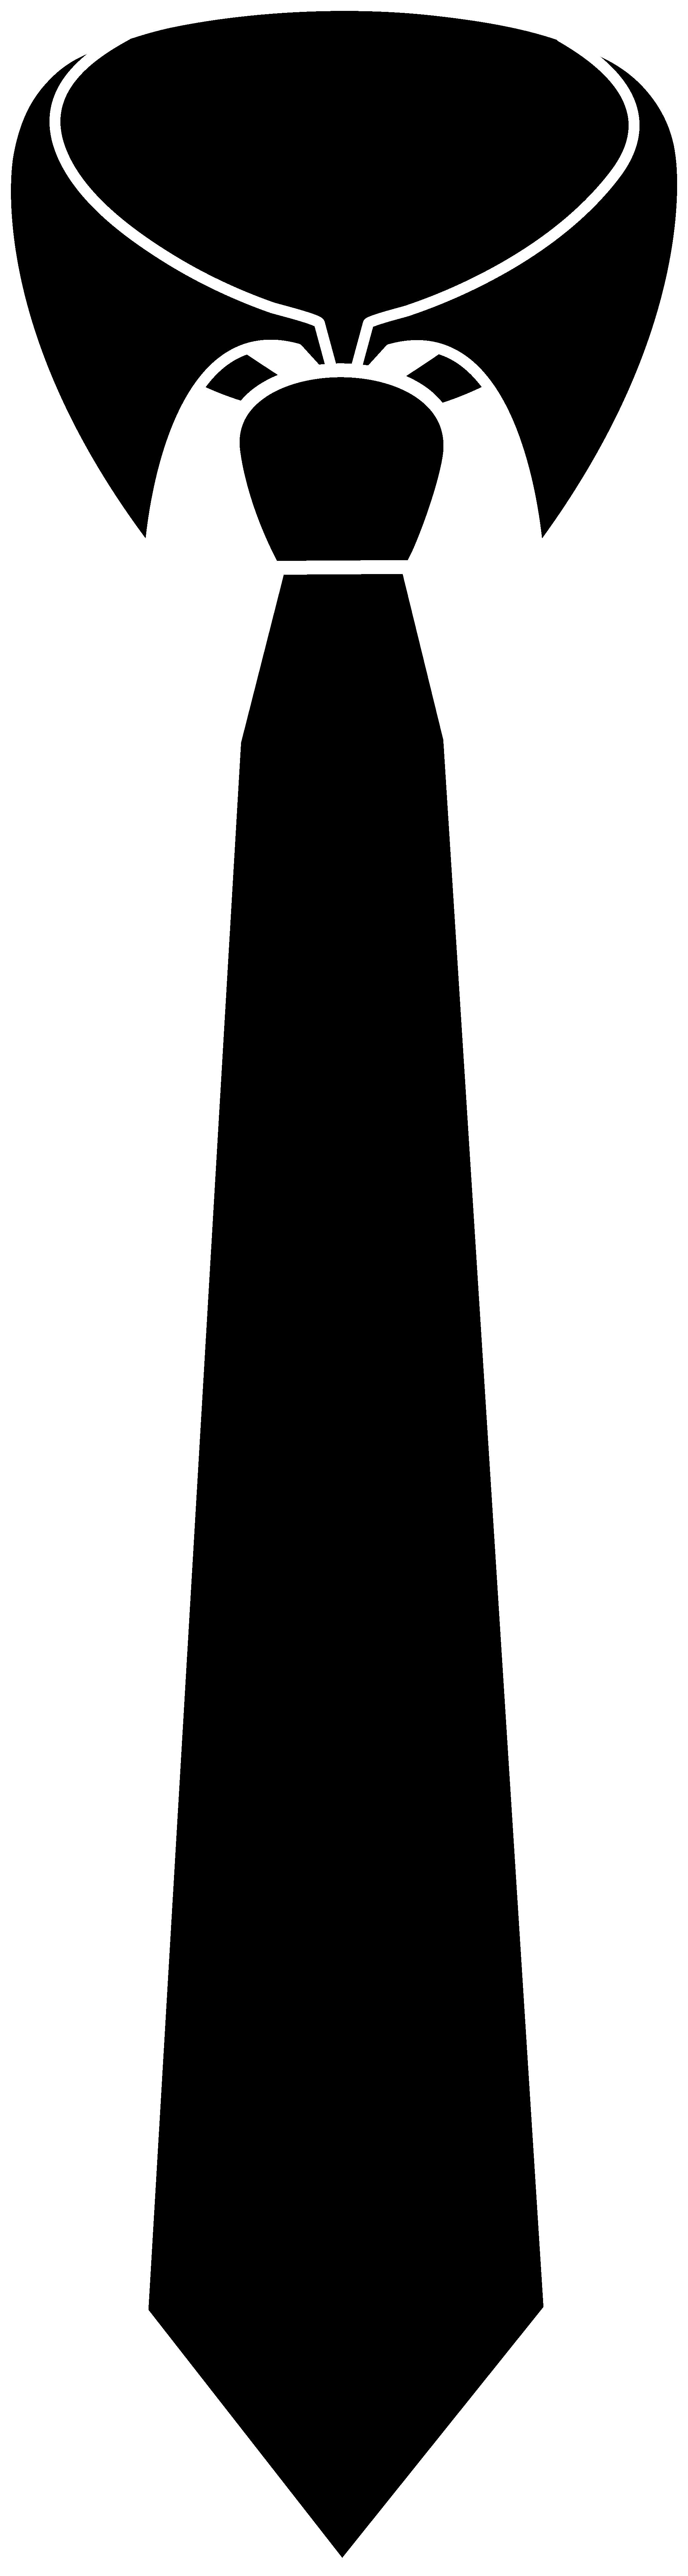 collar clipart